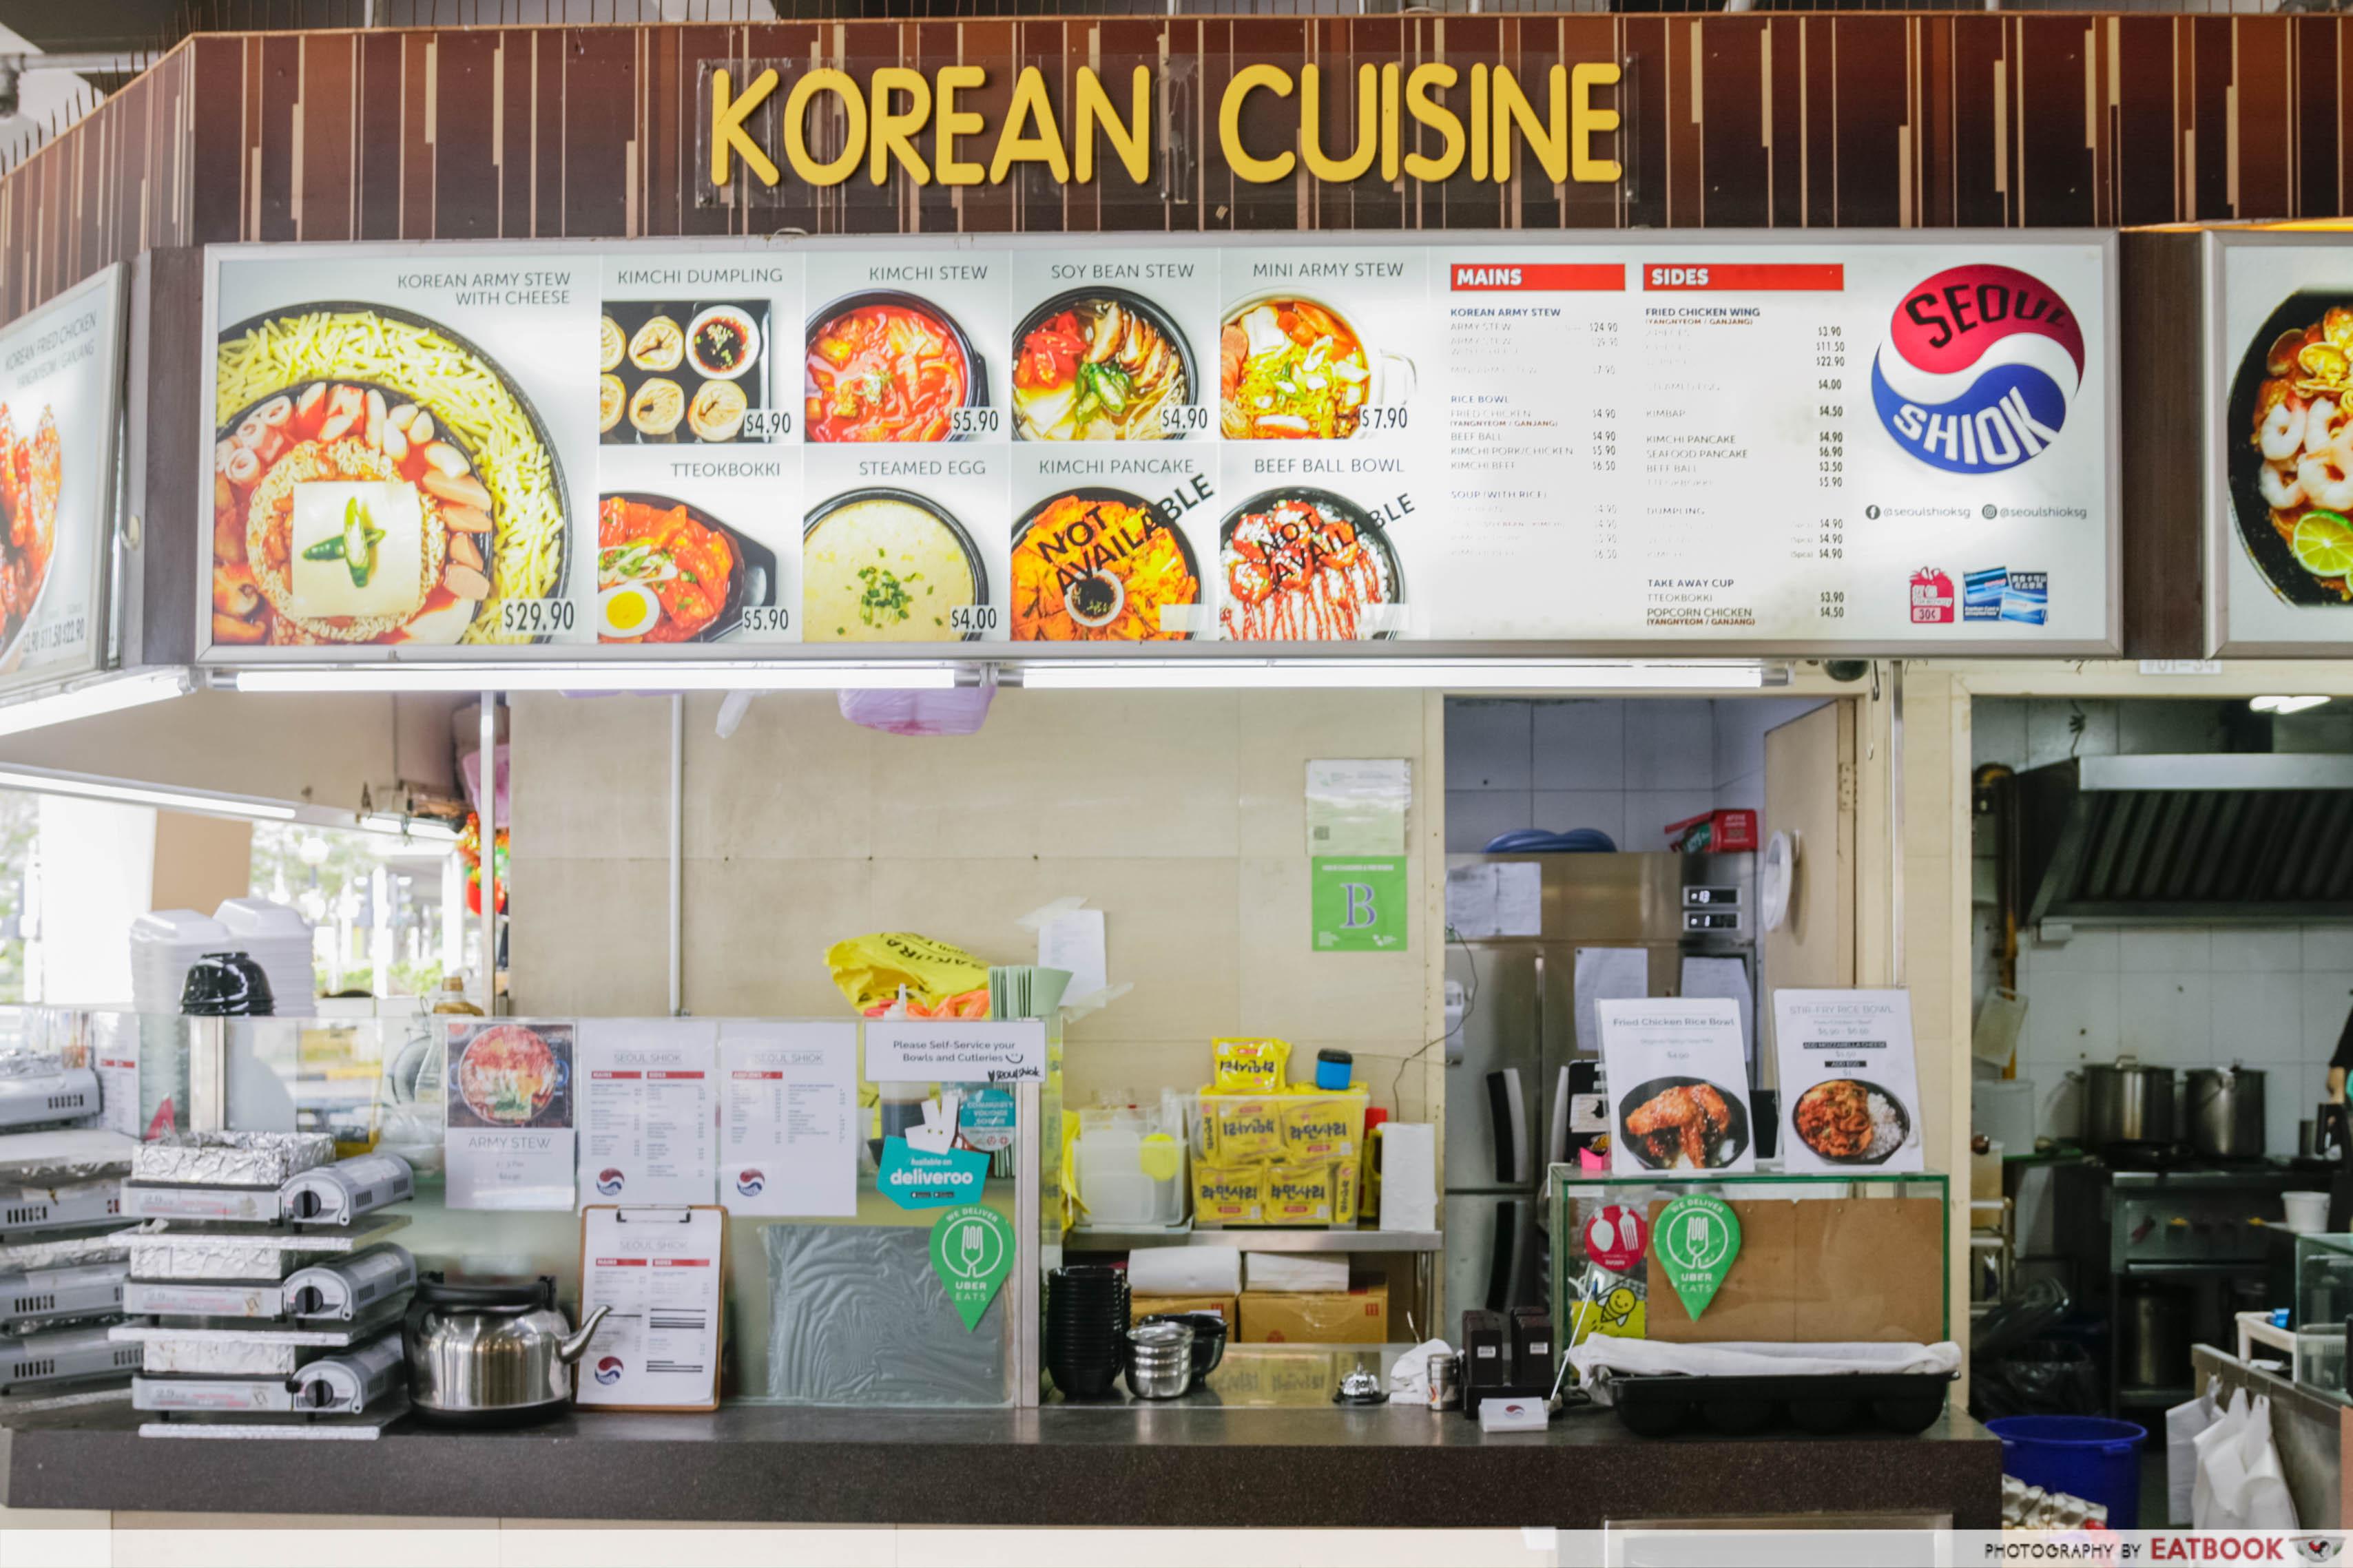 Seoul Shiok - storefront